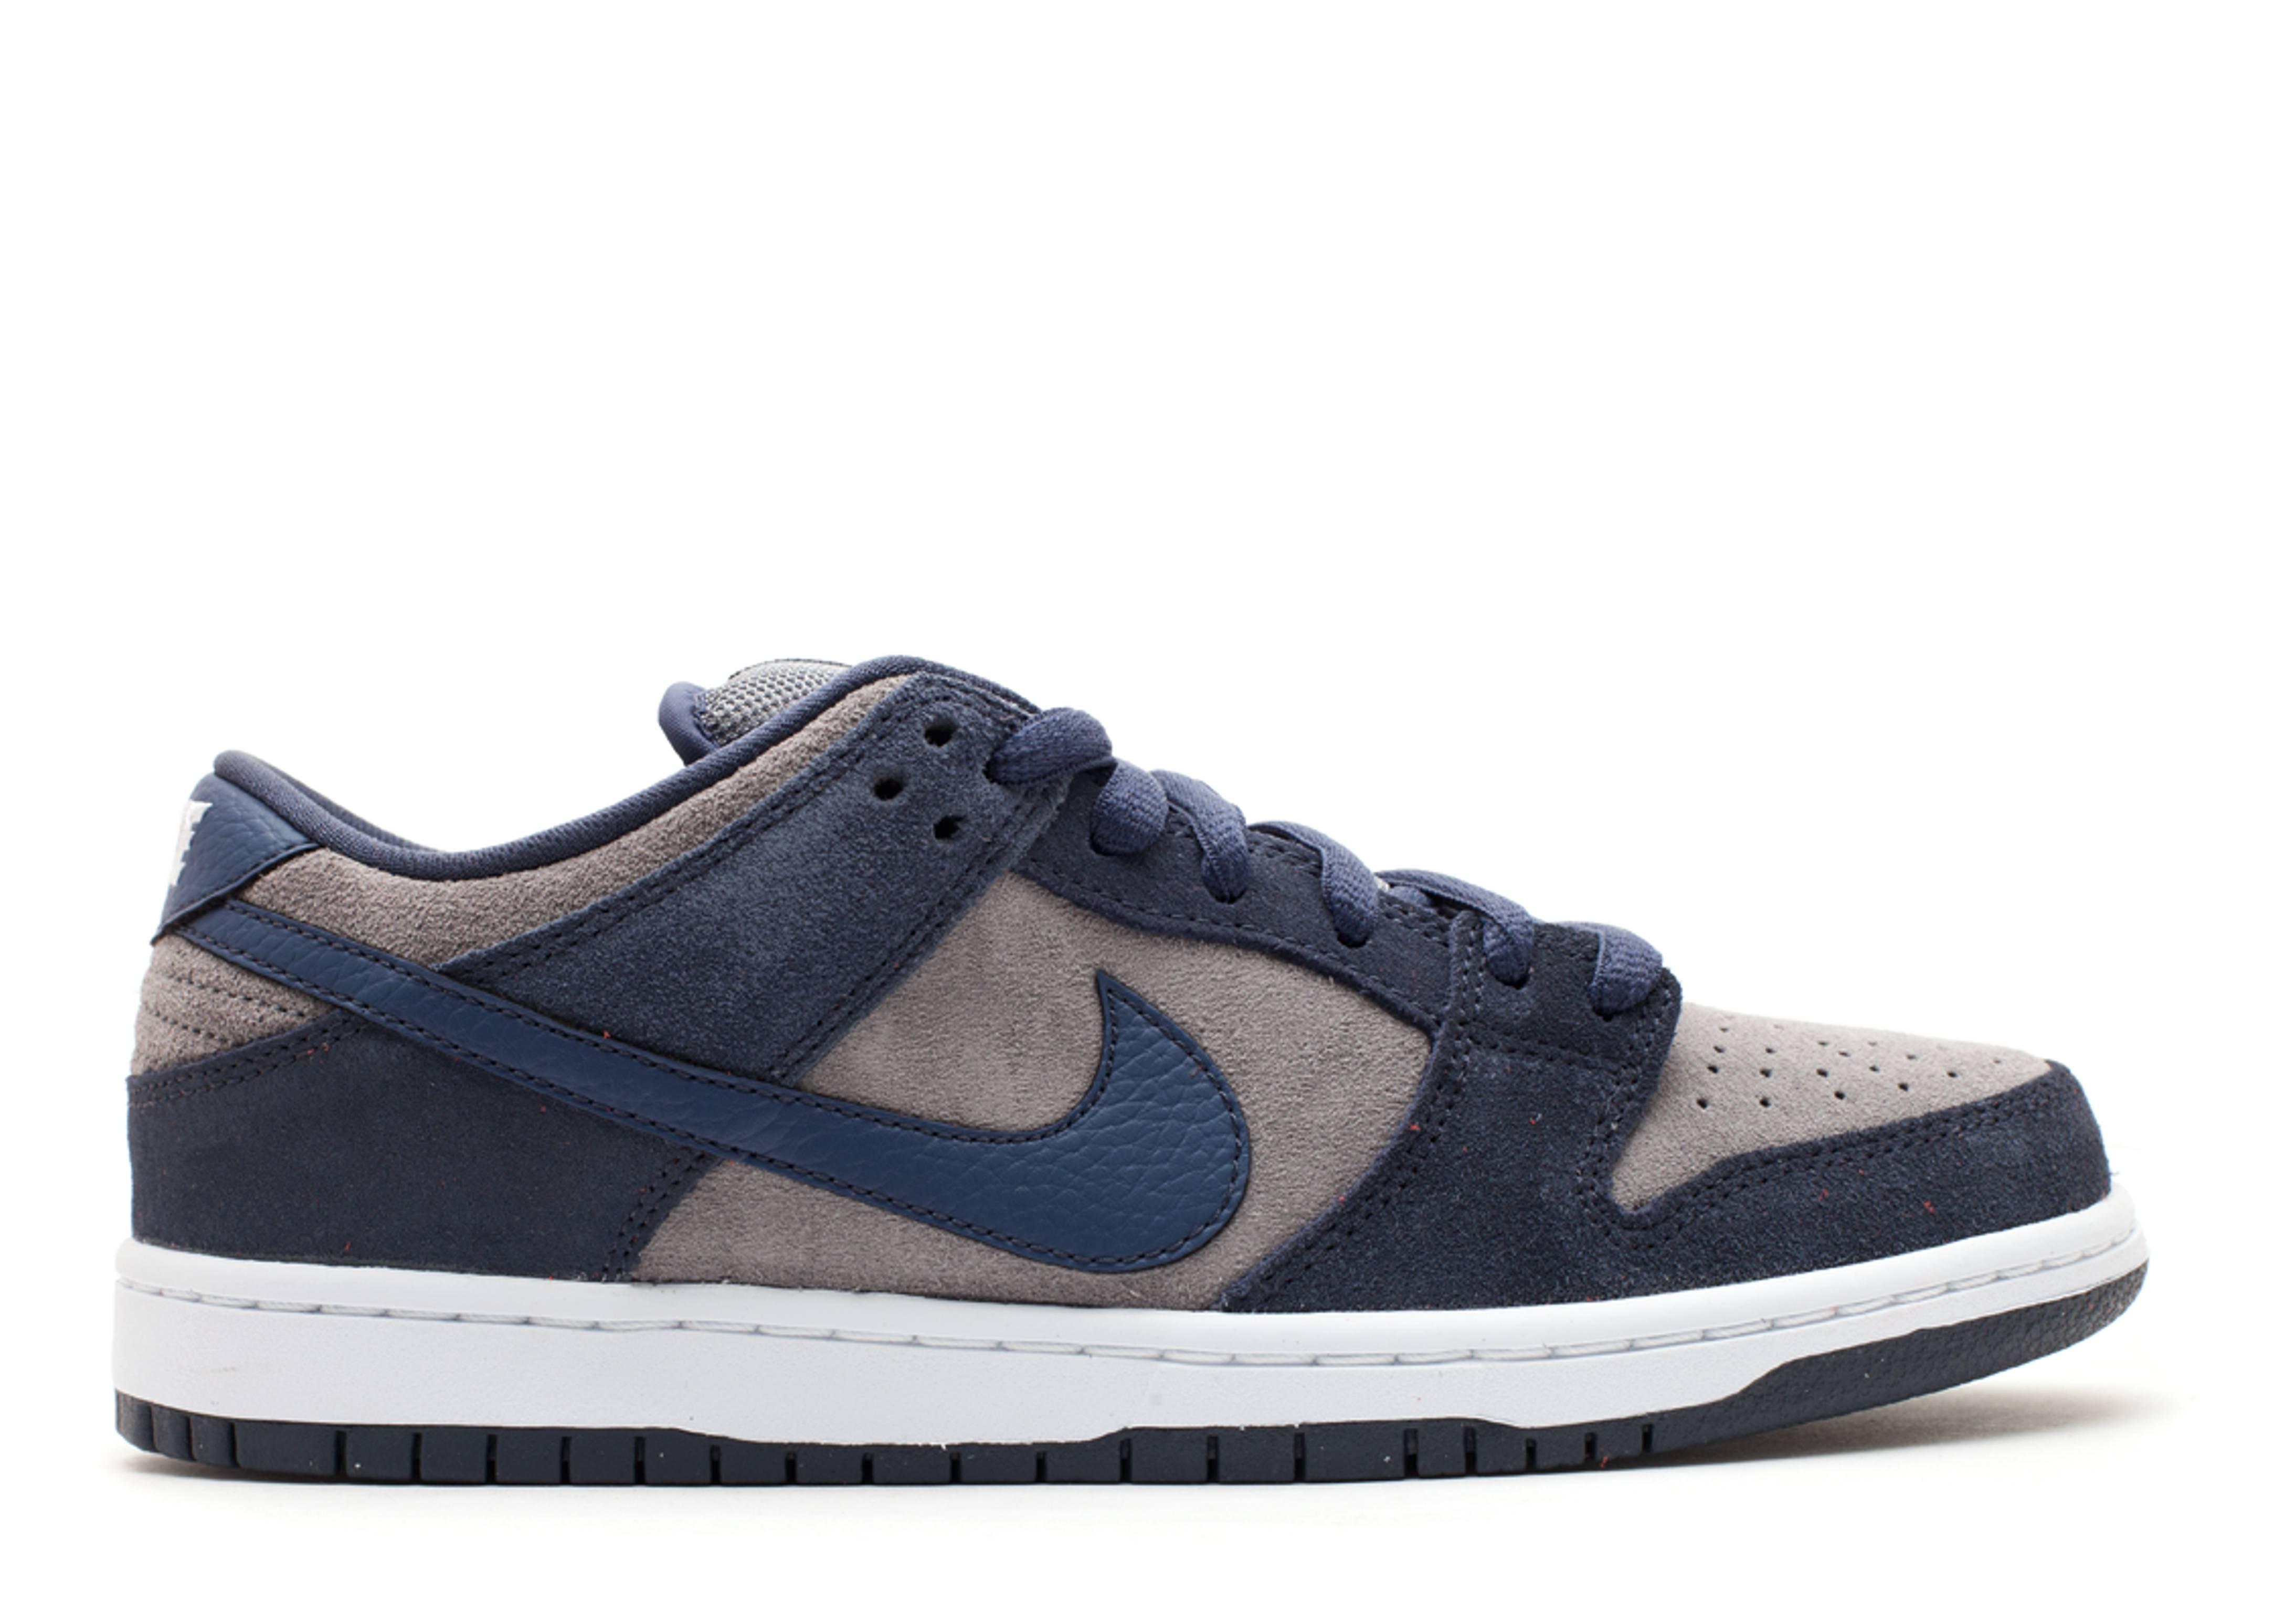 46cf52ab390b Dunk Low Pro Sb - Nike - 304292 409 - thunder blue cool grey-white ...